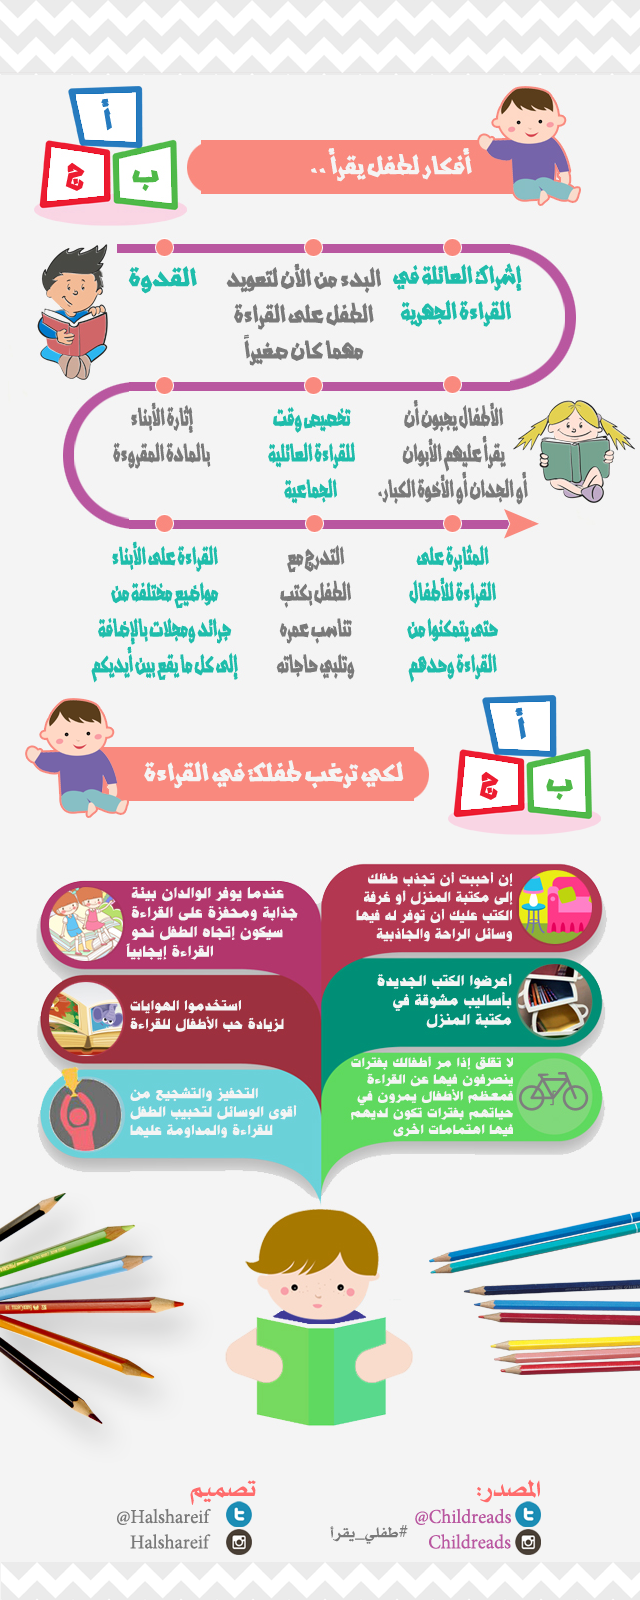 انفوجرافيك أفكار لطفل يقرأ انفوجرافيك إنفوجرافيك Islamic Kids Activities Baby Education Kids Planner